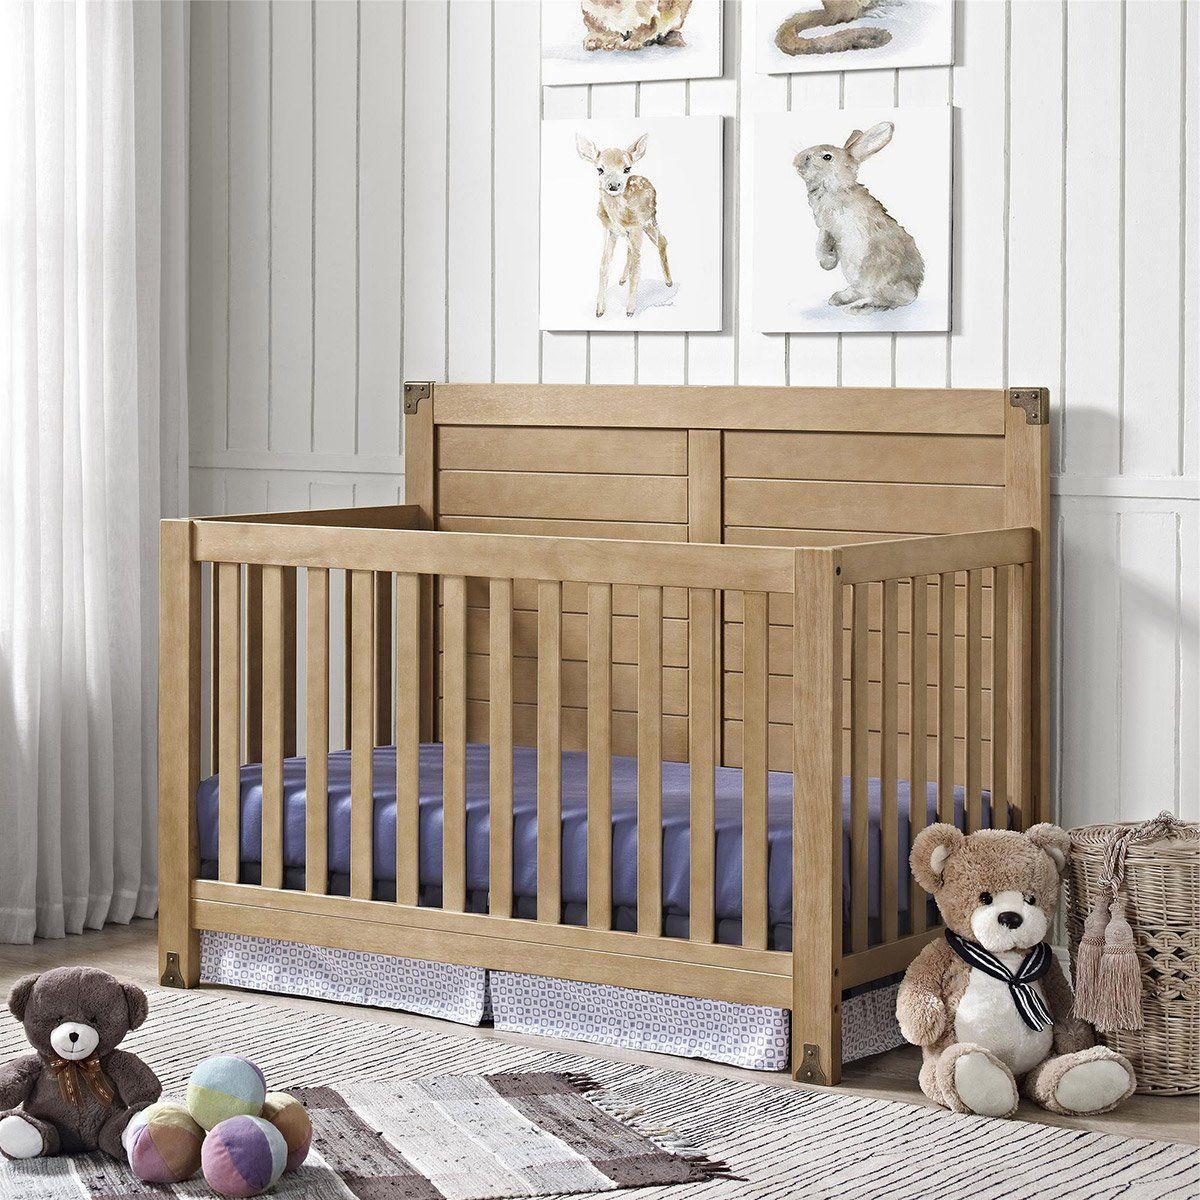 Baby Relax Ridgeline 4 in 1 Convertible Crib - Rustic ...